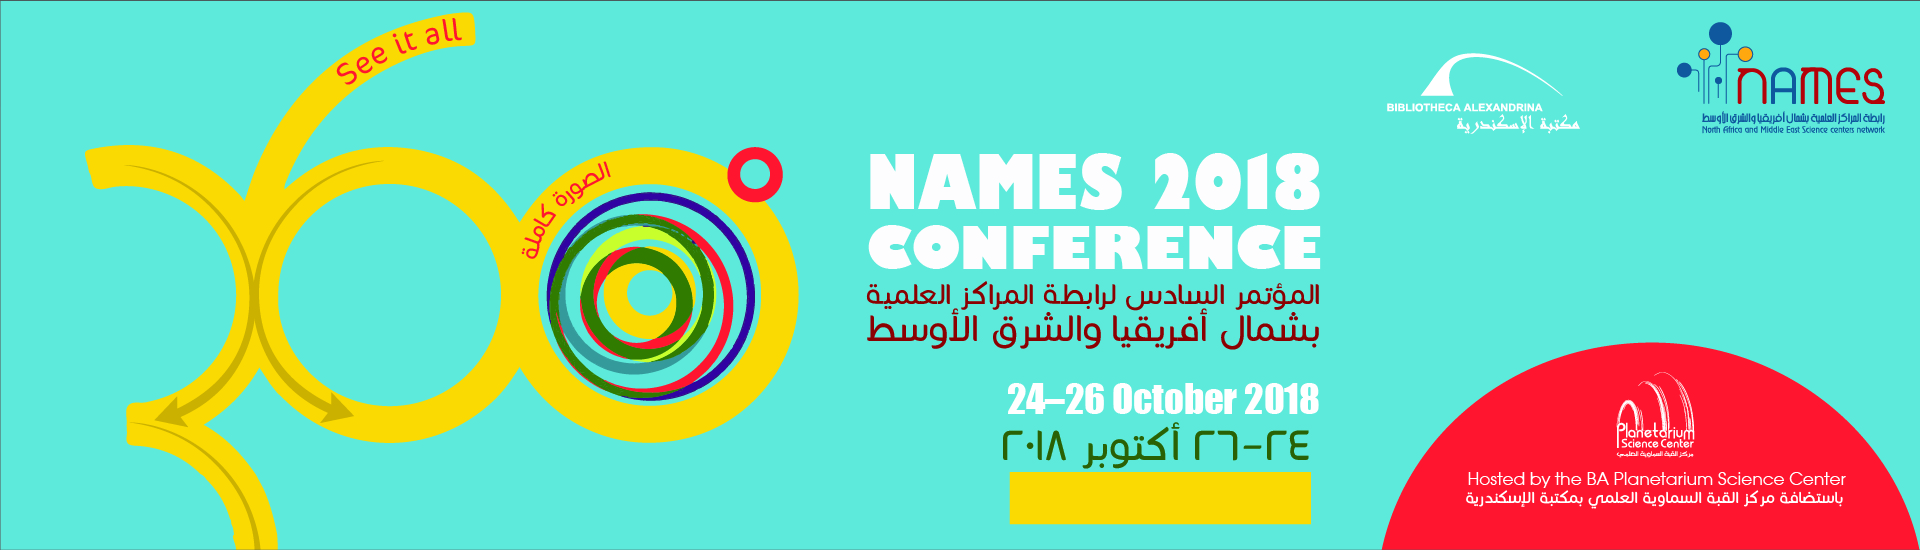 names 2018